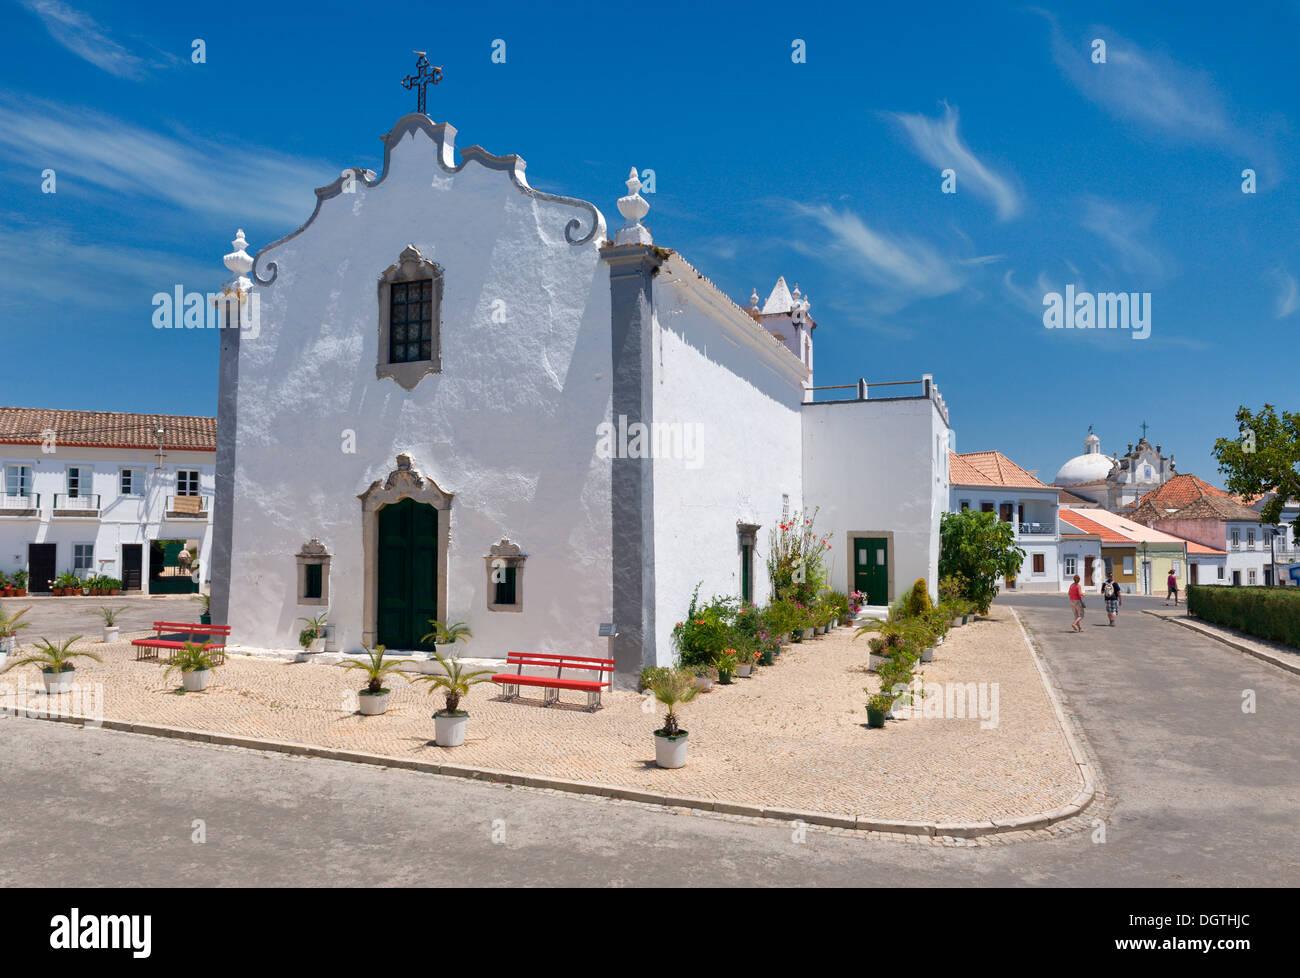 Portugal, the Algarve, Tavira, one of the many churches, the Ermida de Sao Bras - Stock Image